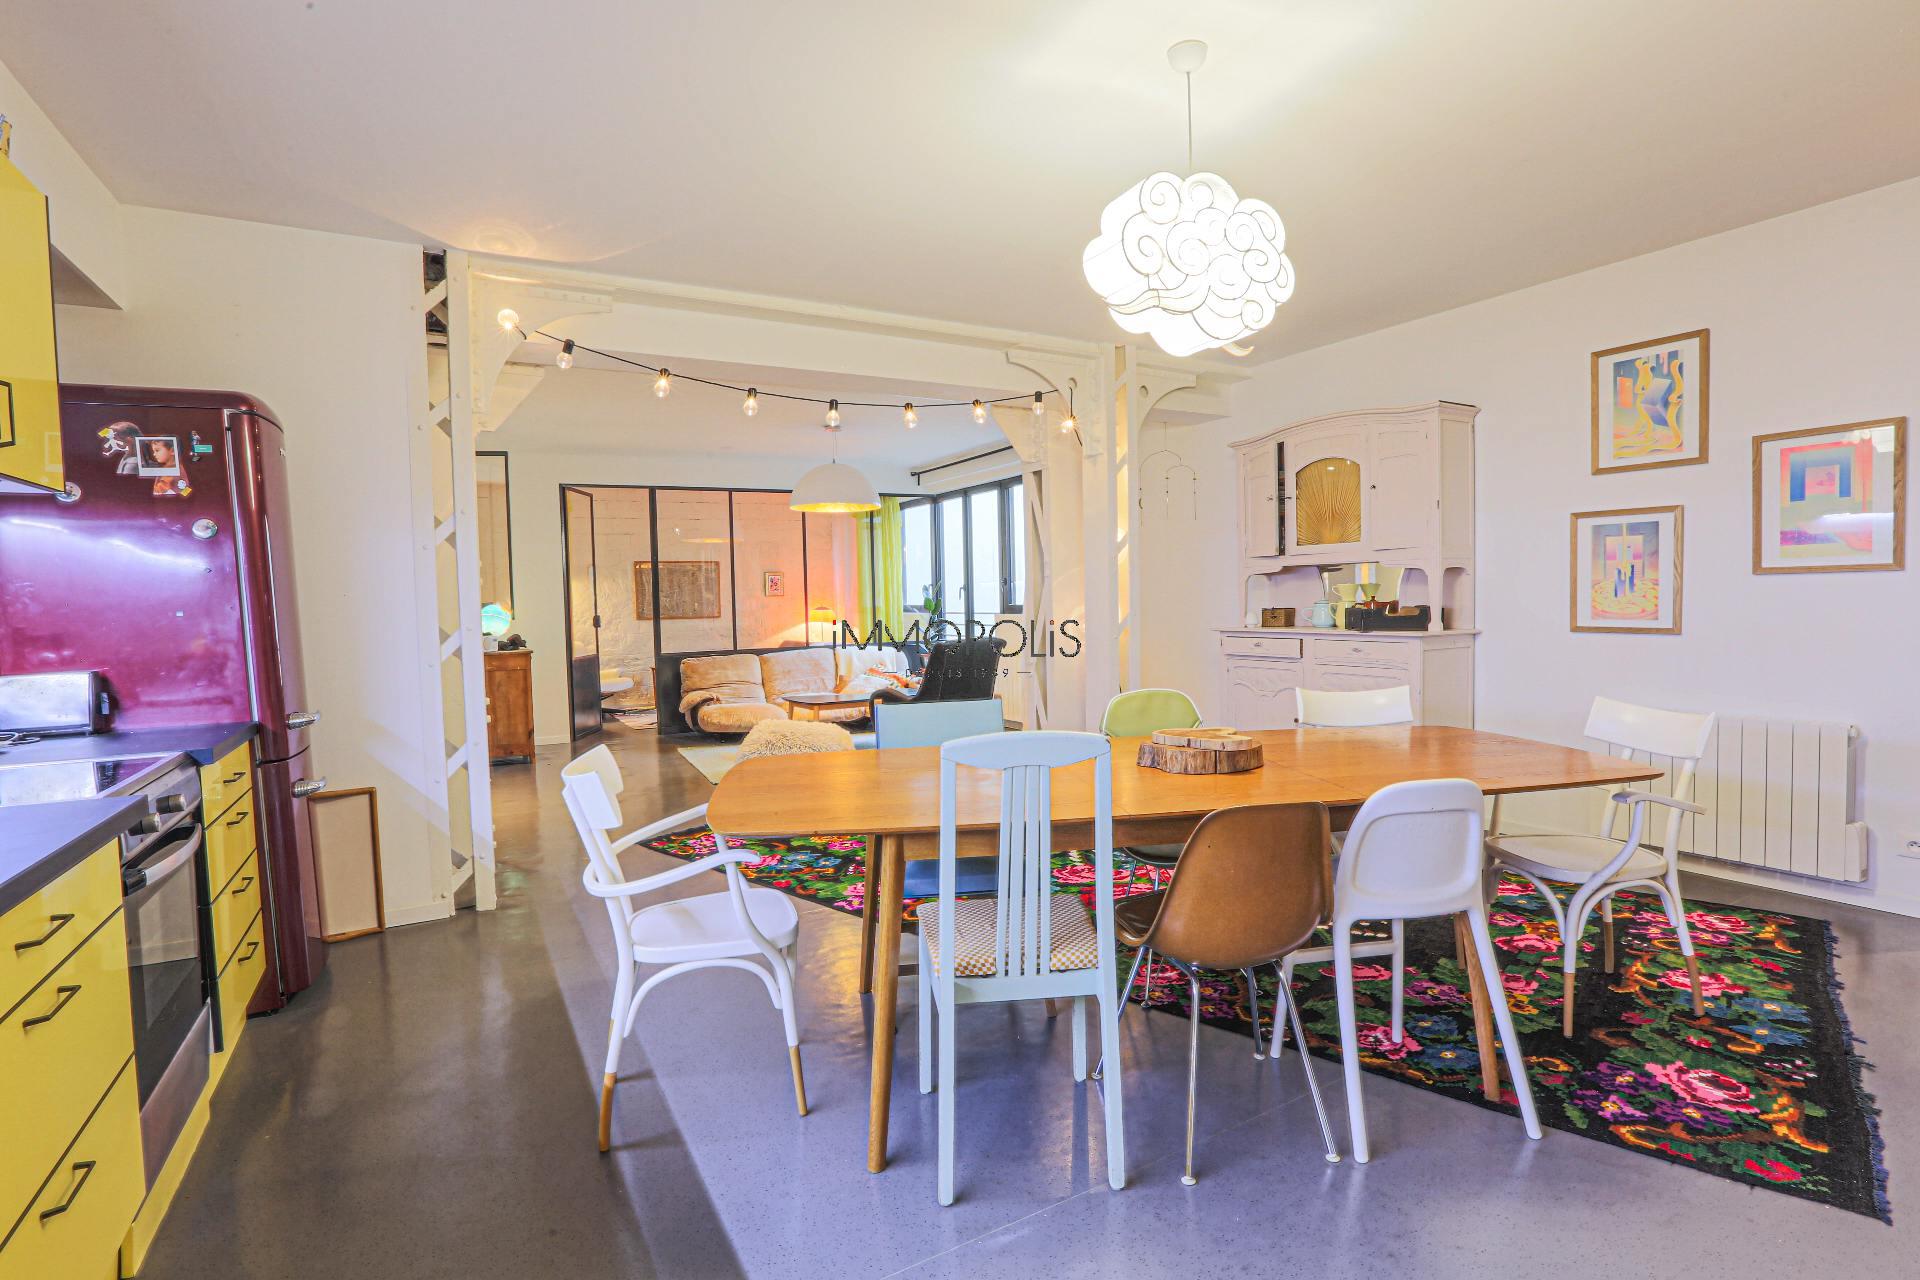 Very good deal! 160 M² loft / industrial apartment «like a house»! 3